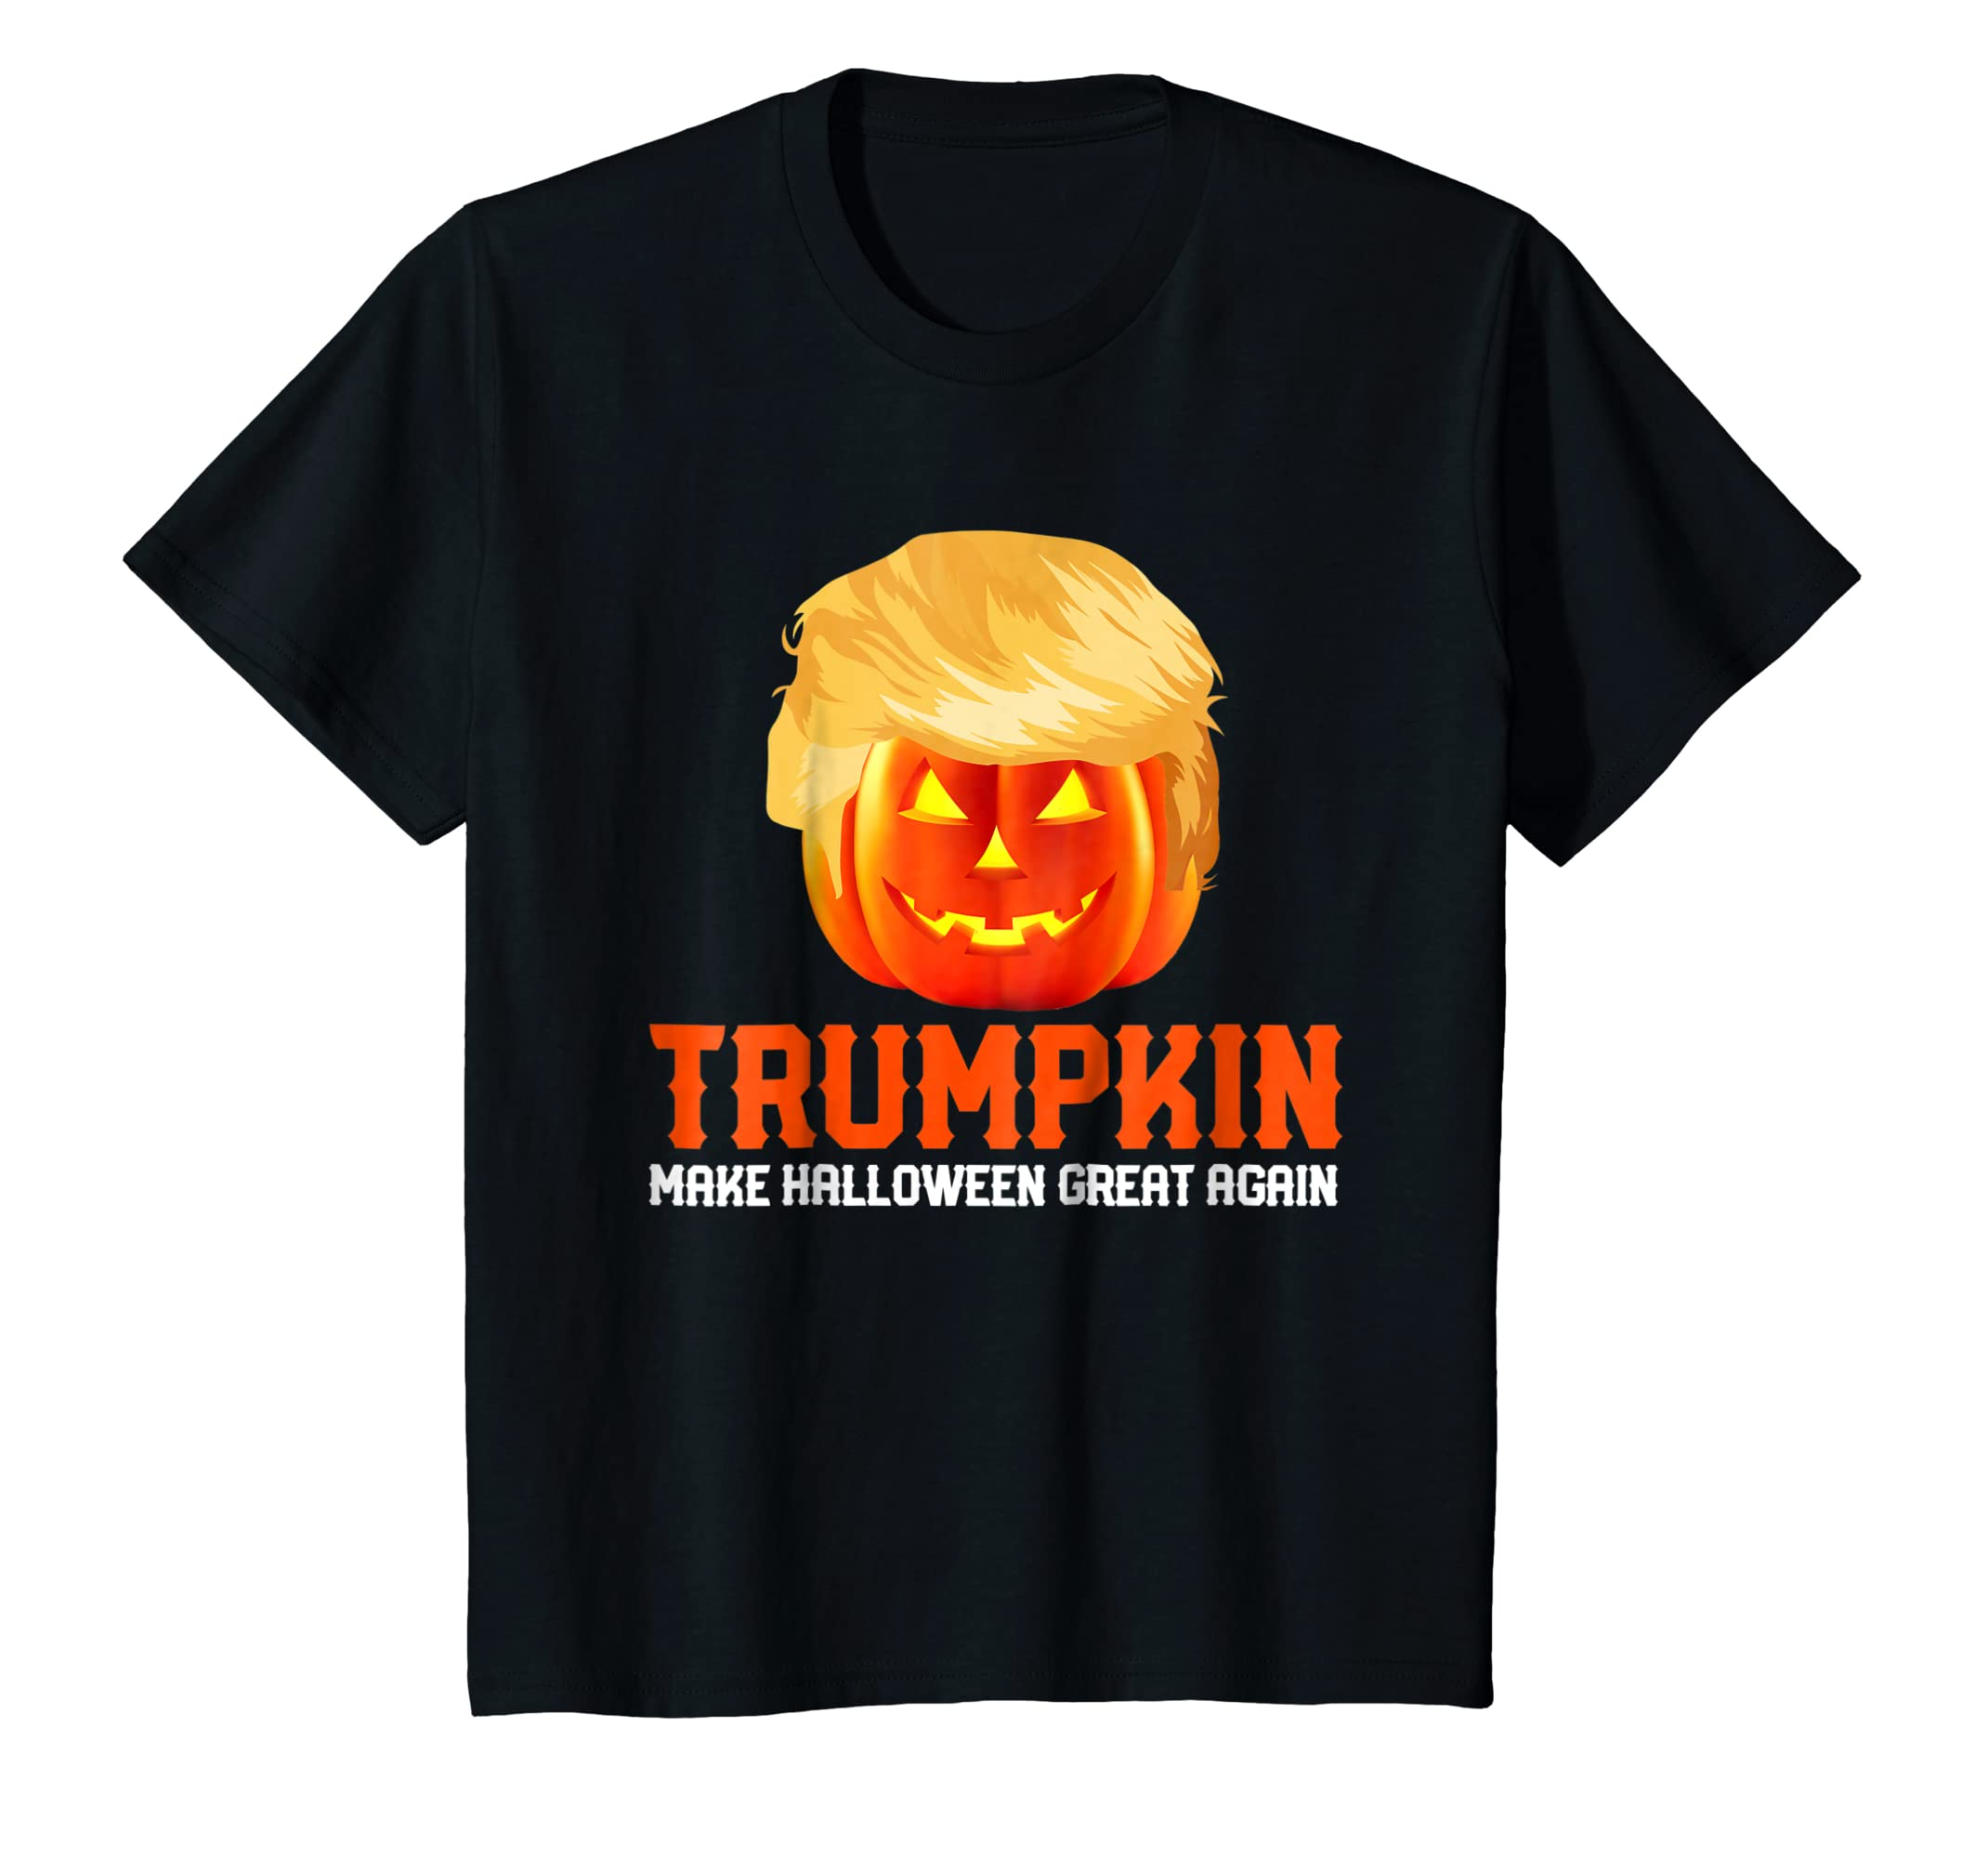 TRUMPKIN T SHIRT Funny Halloween Trump Pumpkin Costume Gift